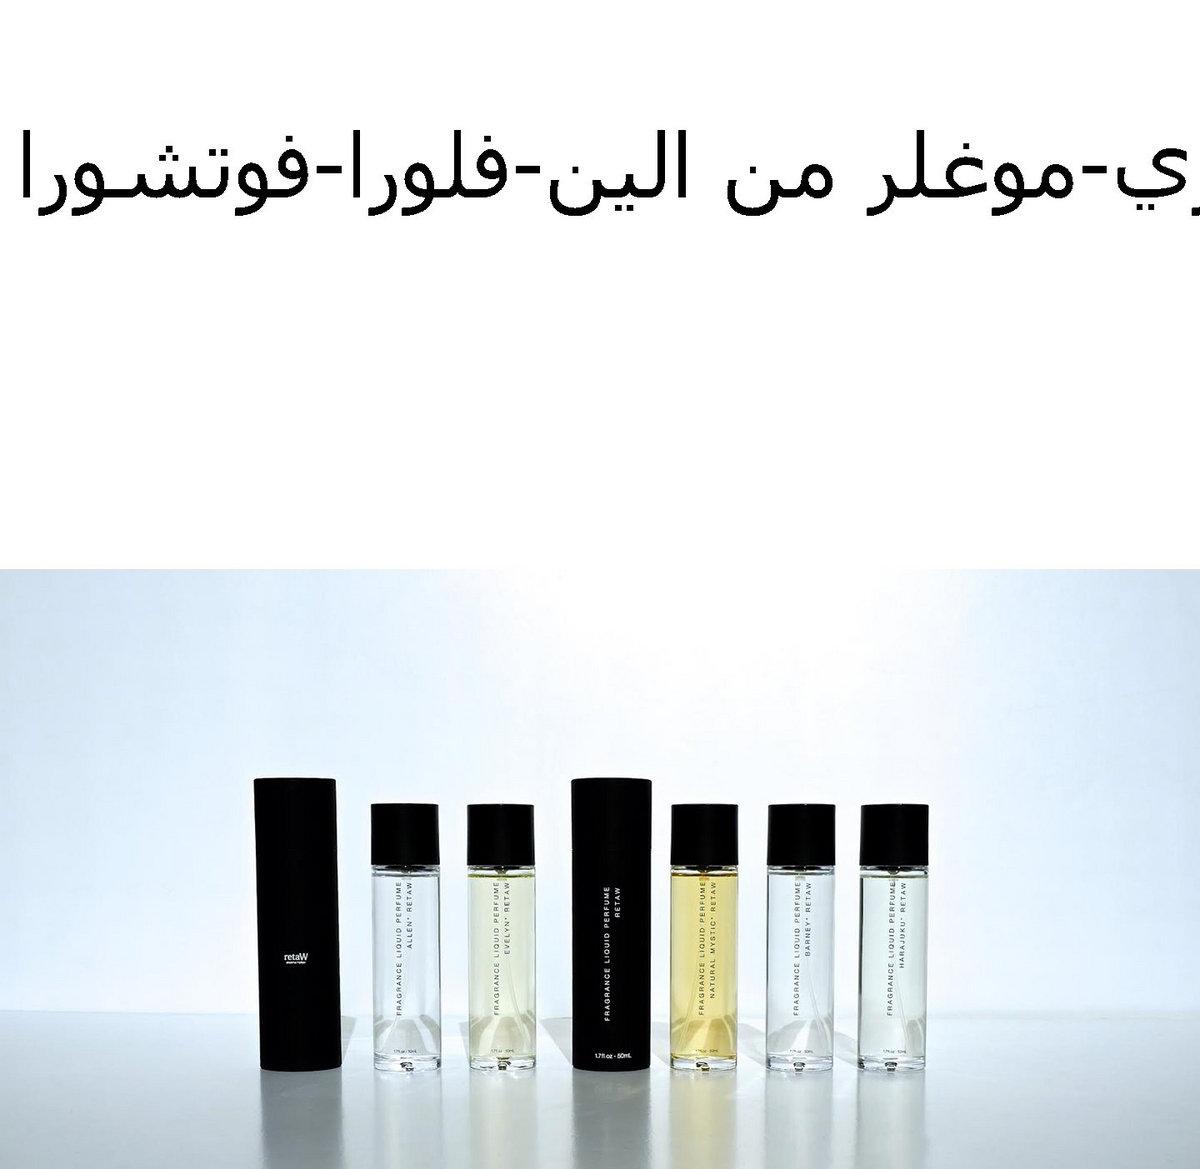 8305547d8 السعوديه) تييري-موغلر من الين-فلورا-فوتشورا على الخصم اشتري عطور ...